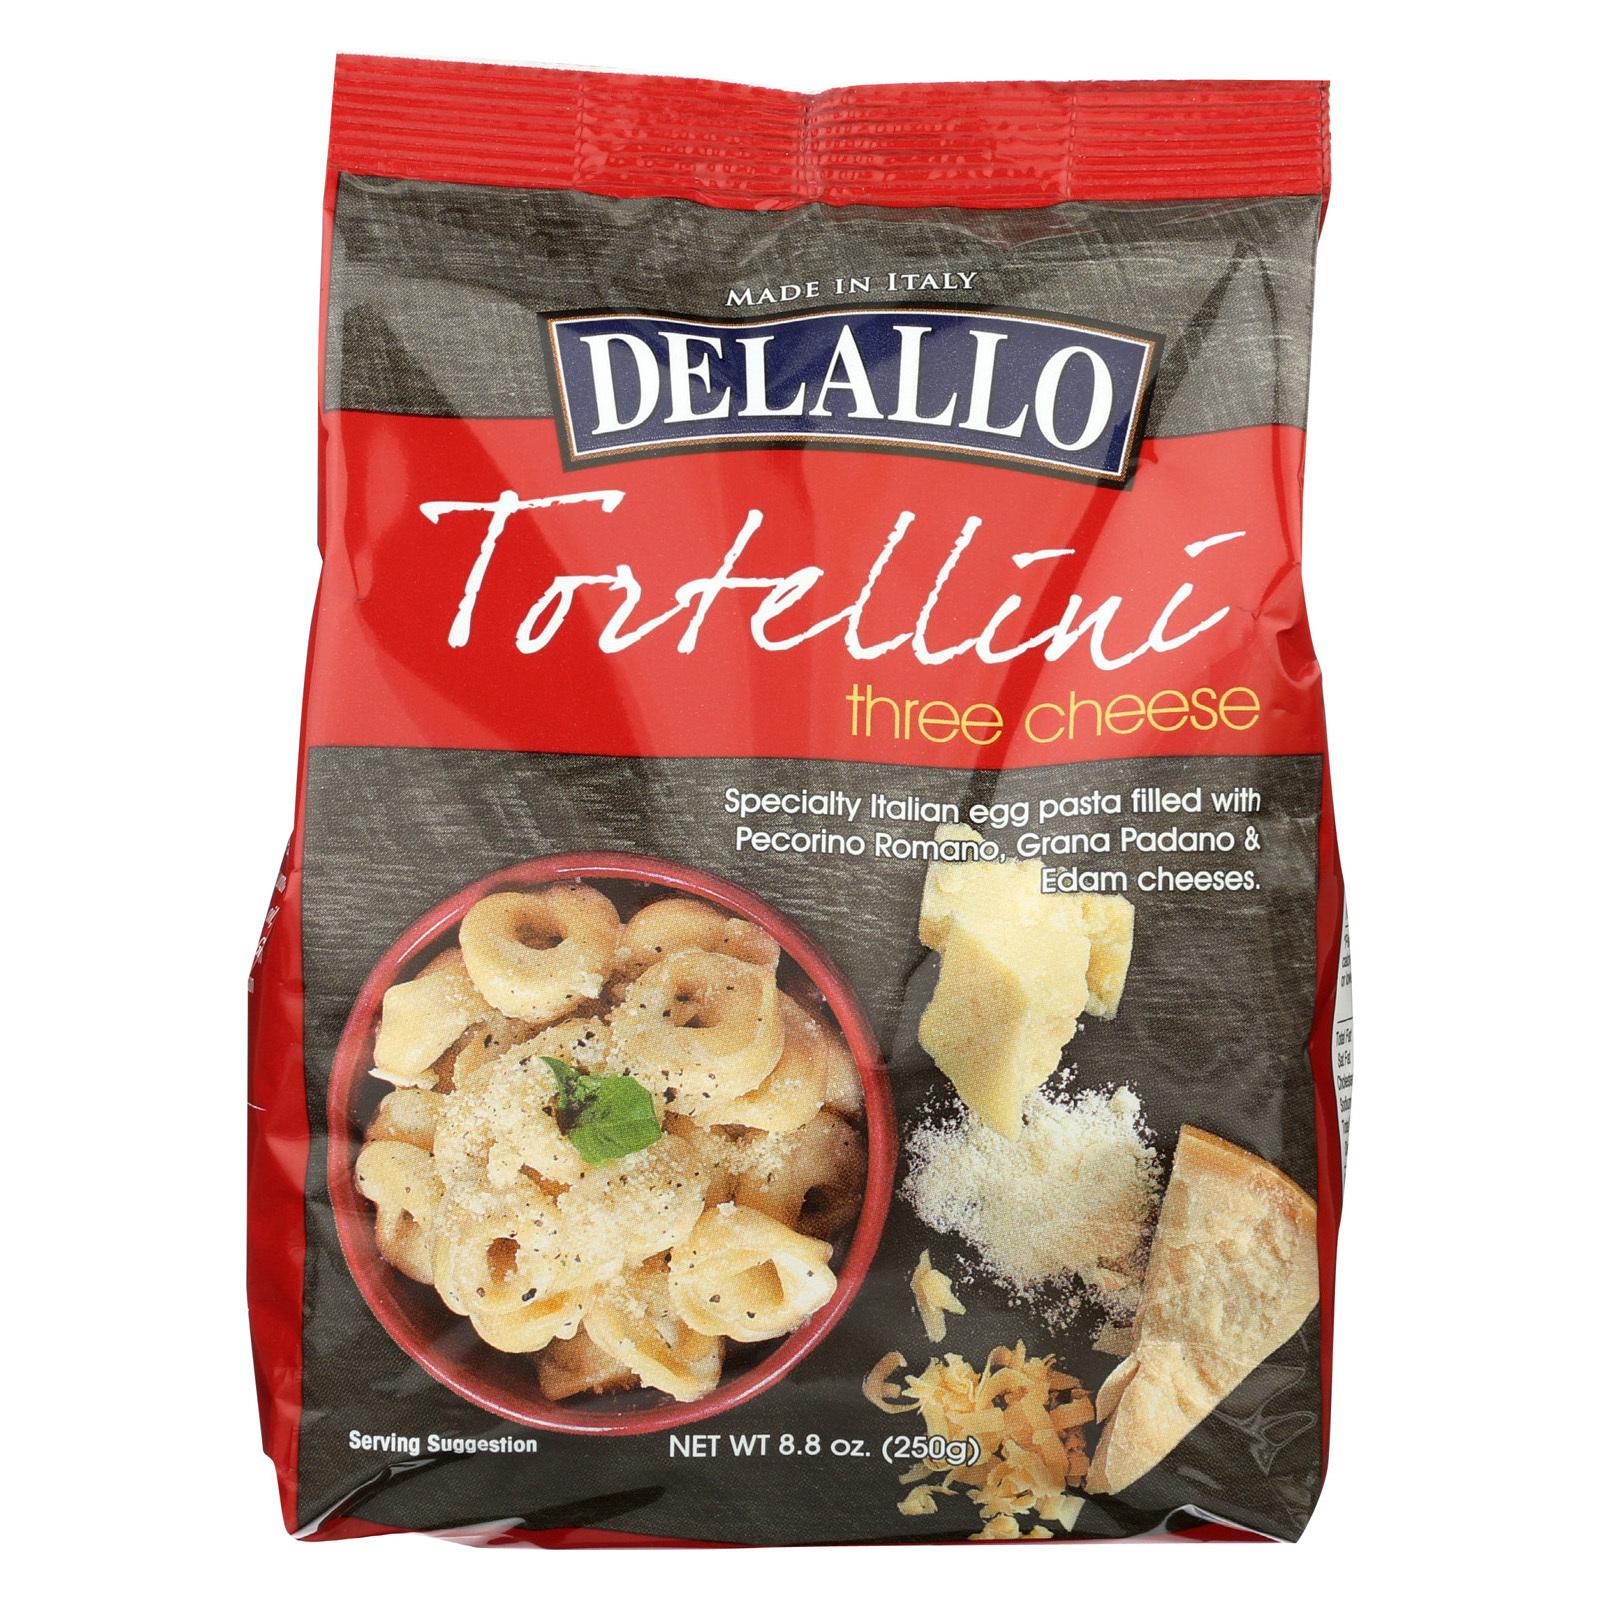 Delallo Tortelini - 3 Cheese - Case of 12 - 8.8 oz